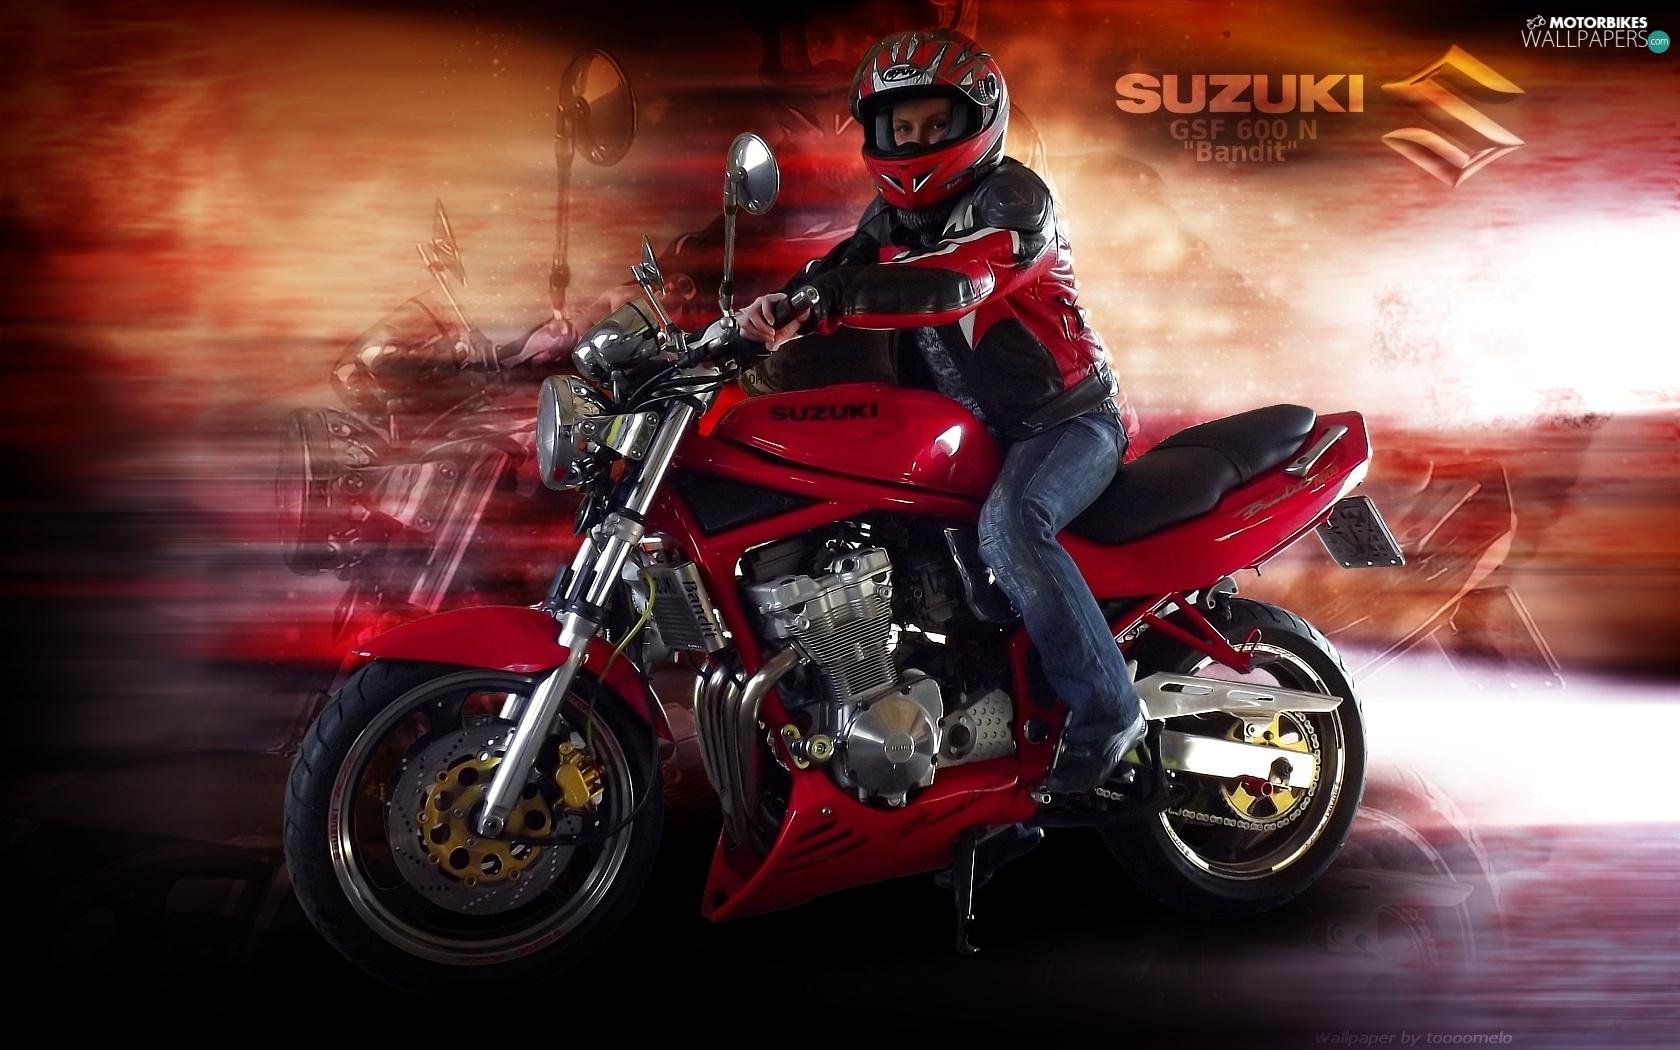 Suzuki GSF 600 N Bandit Motor Bike